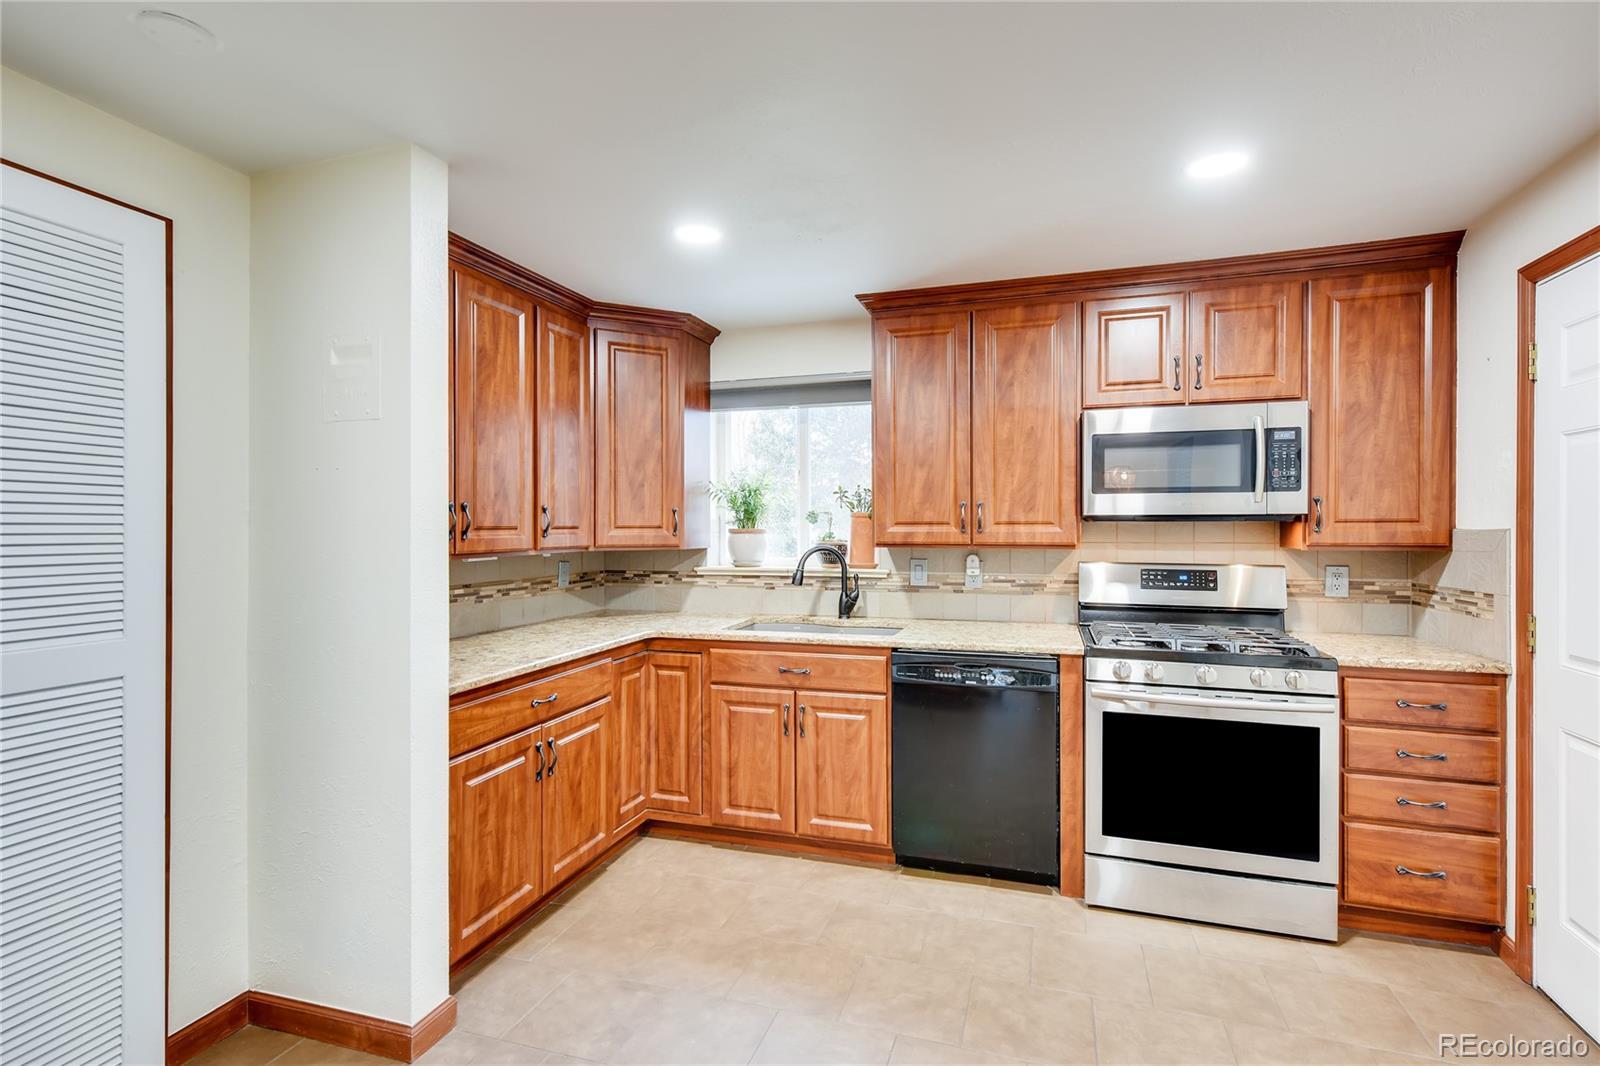 MLS# 5843899 - 6 - 1382 S Canosa Court, Denver, CO 80219